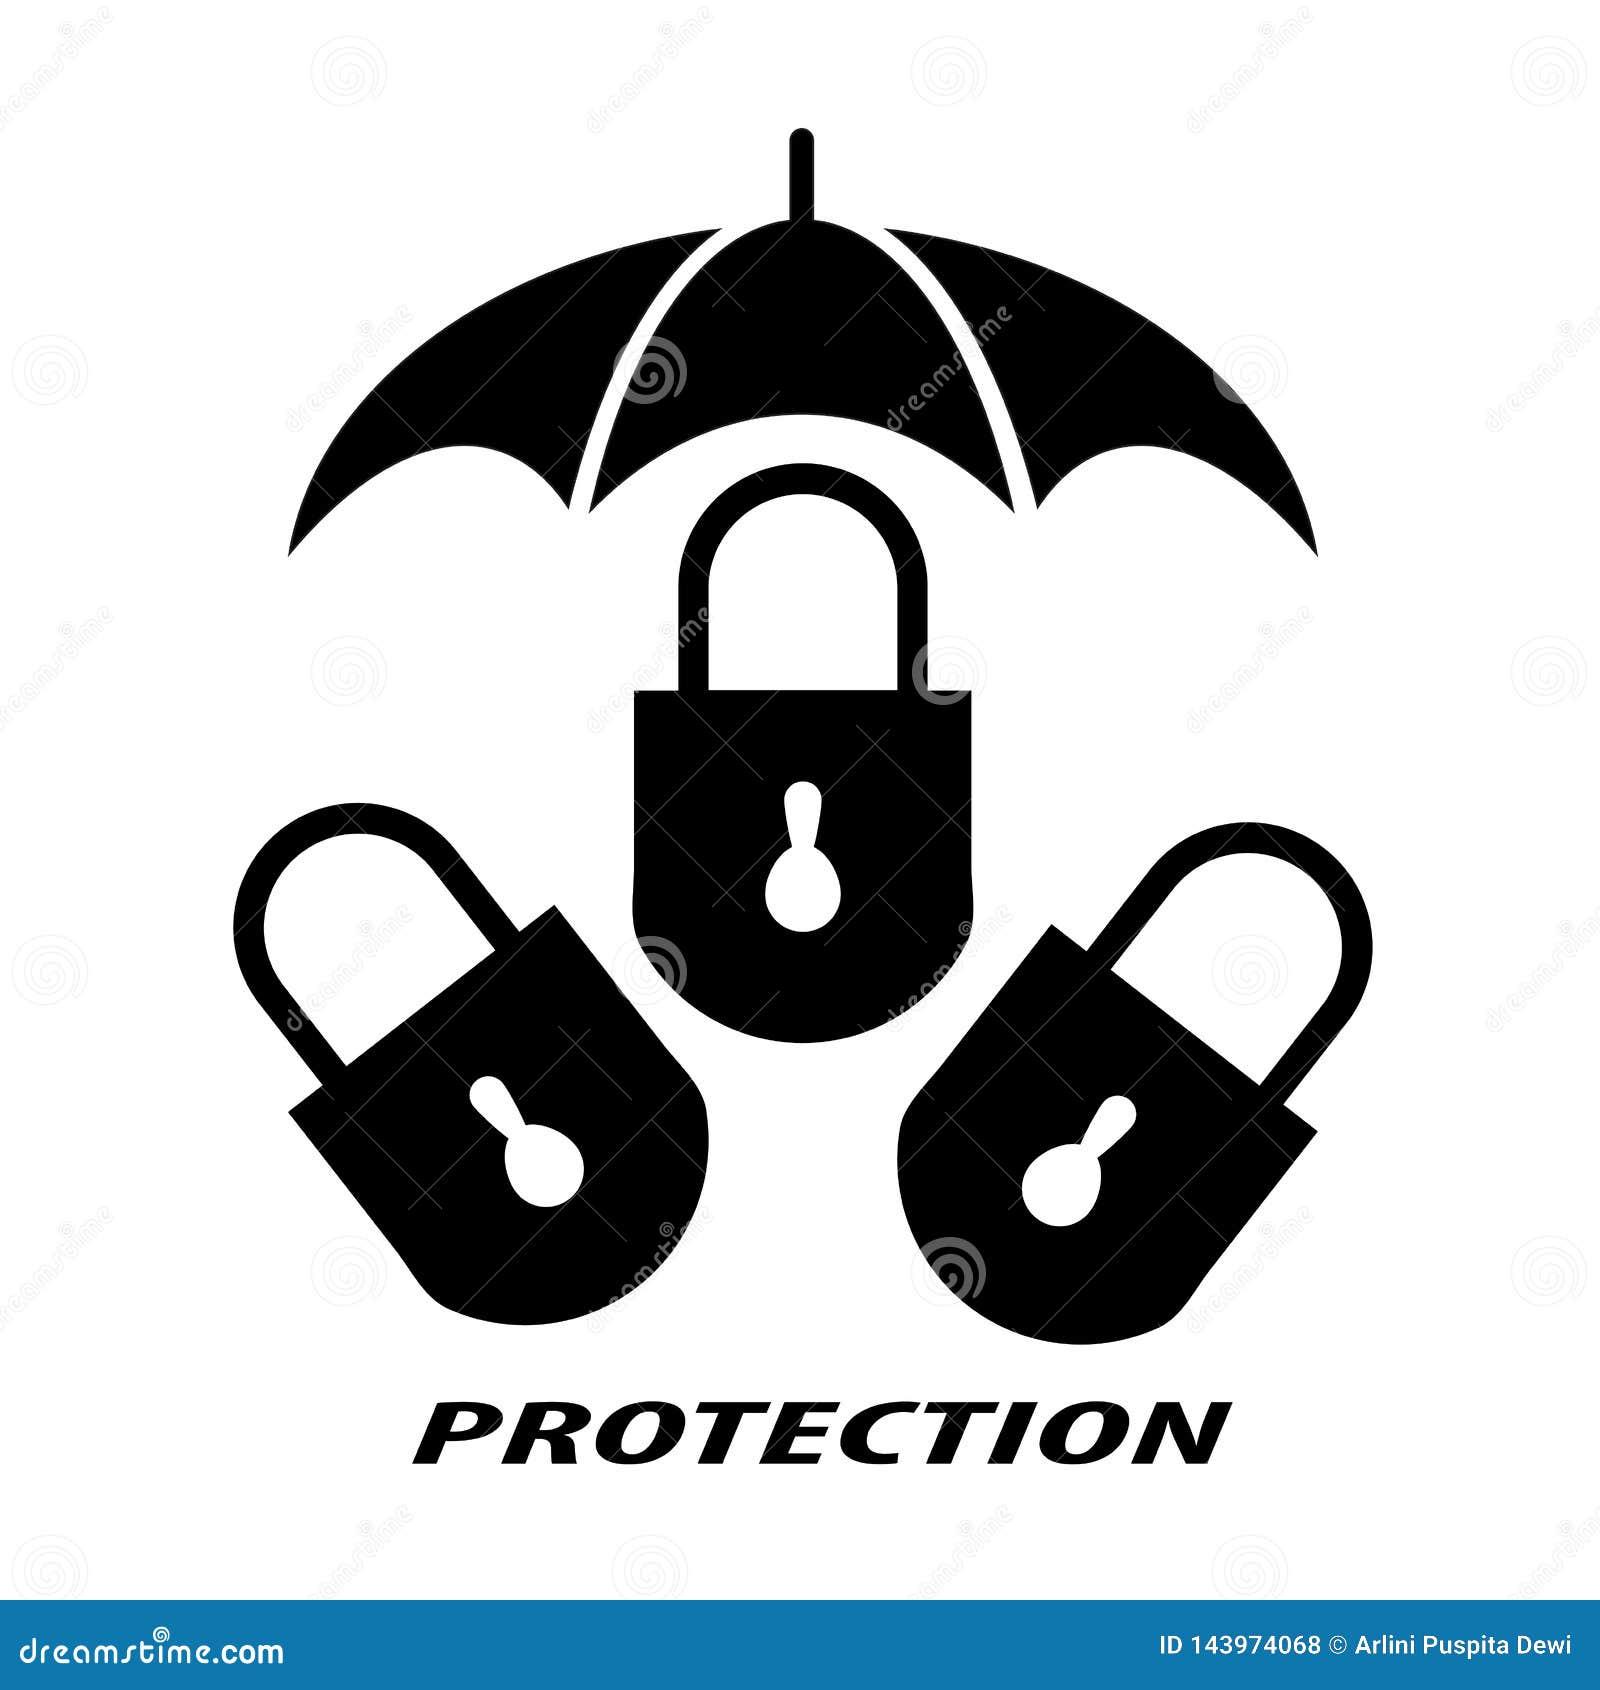 Padlock символизирует защиту